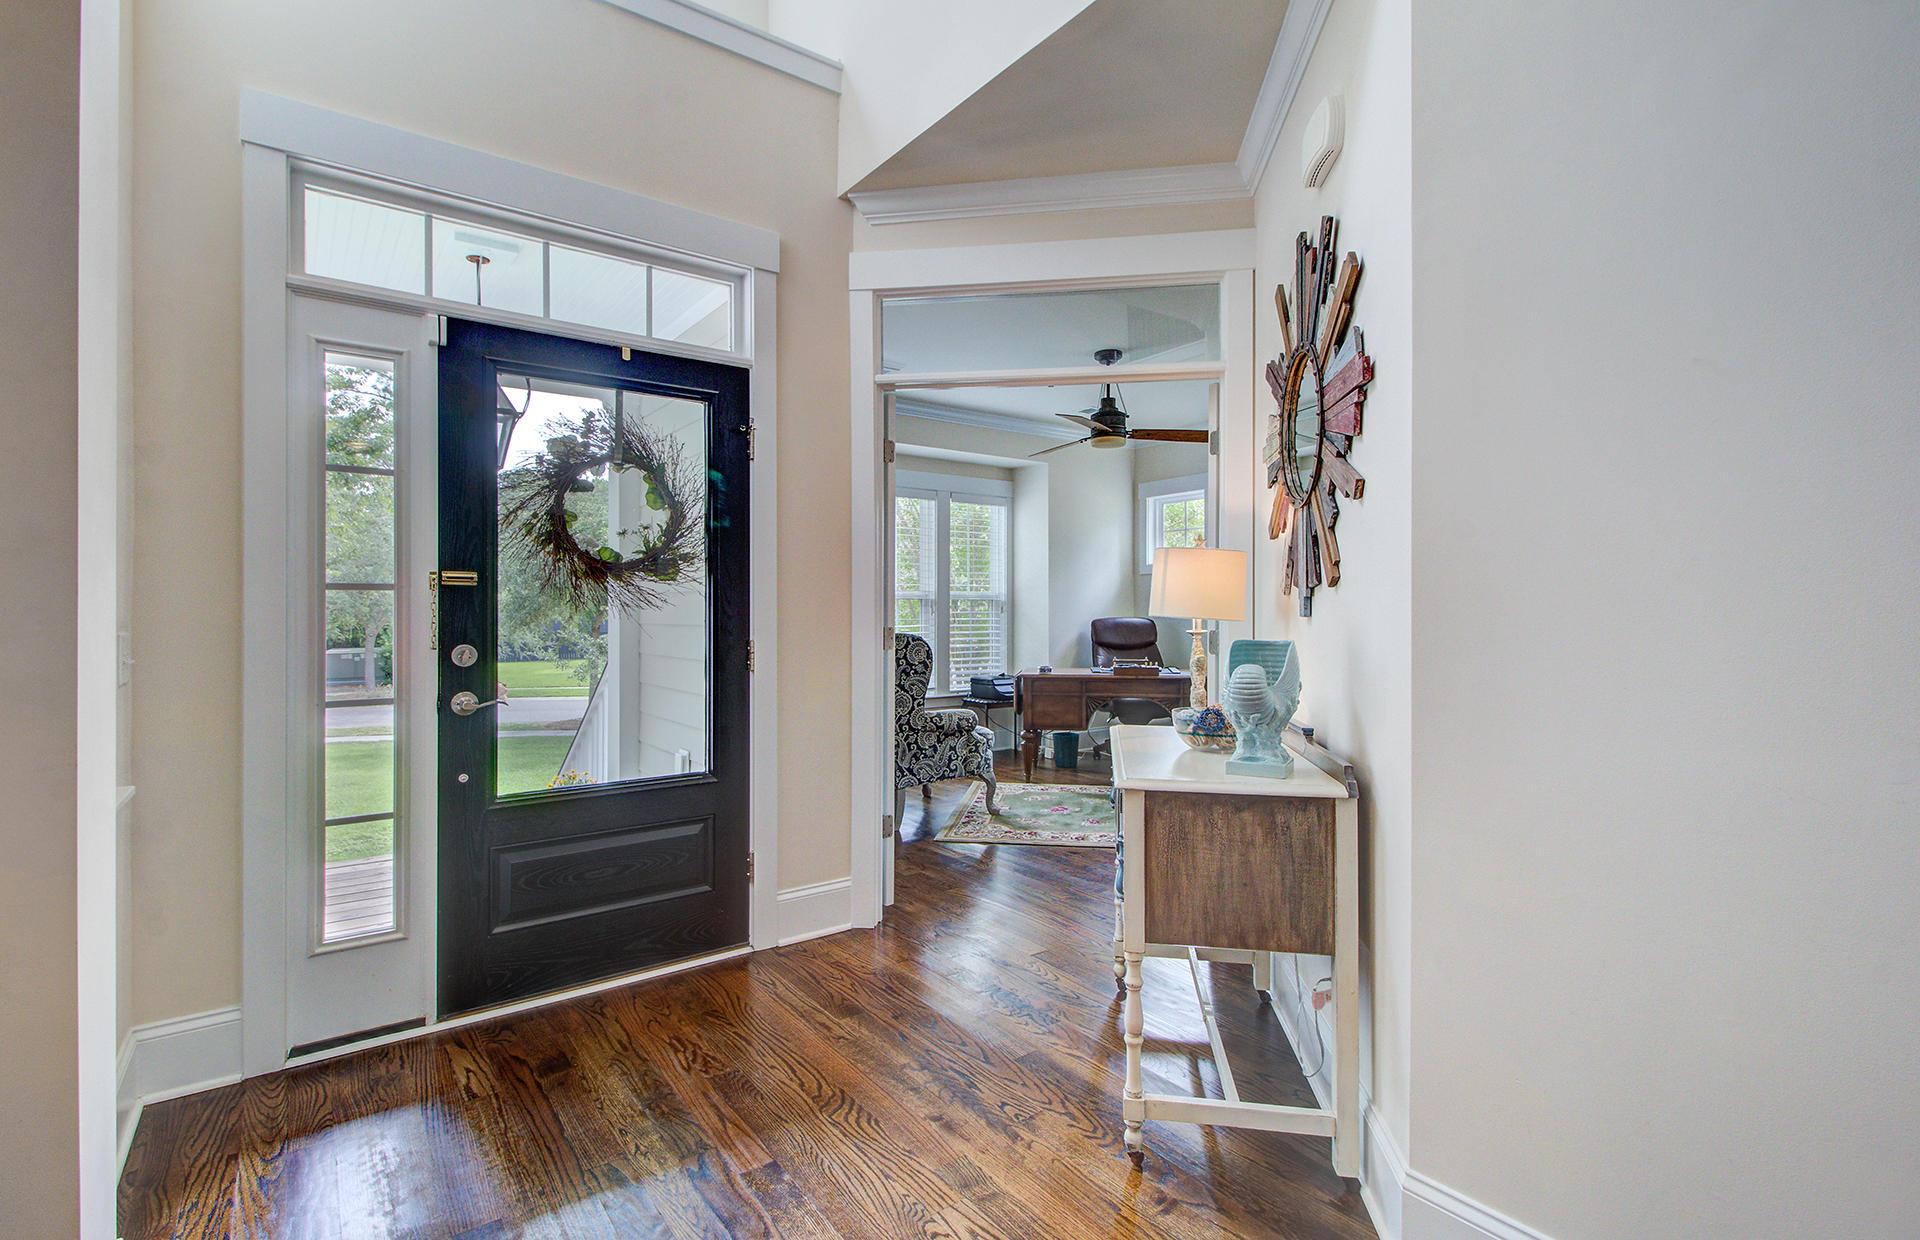 Scotts Creek Homes For Sale - 1404 Scotts Creek, Mount Pleasant, SC - 52